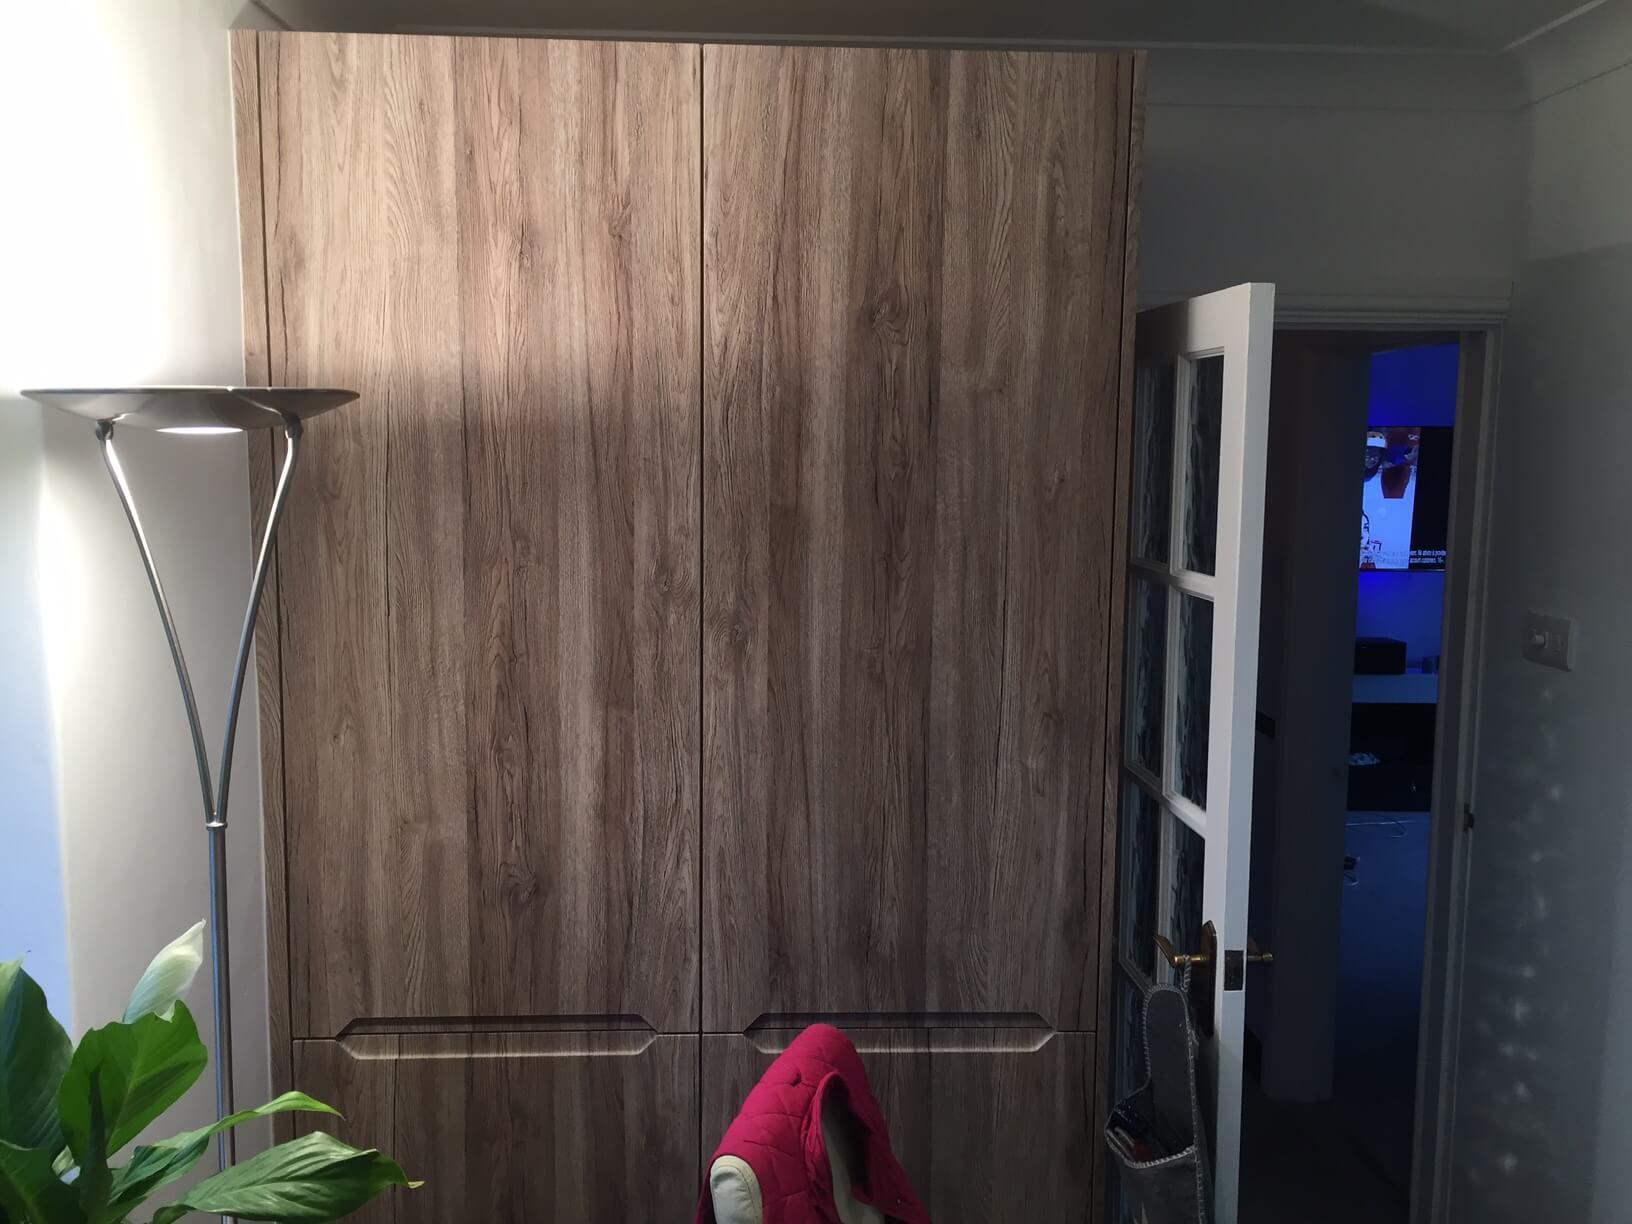 Larder and fridge freezer cupboards